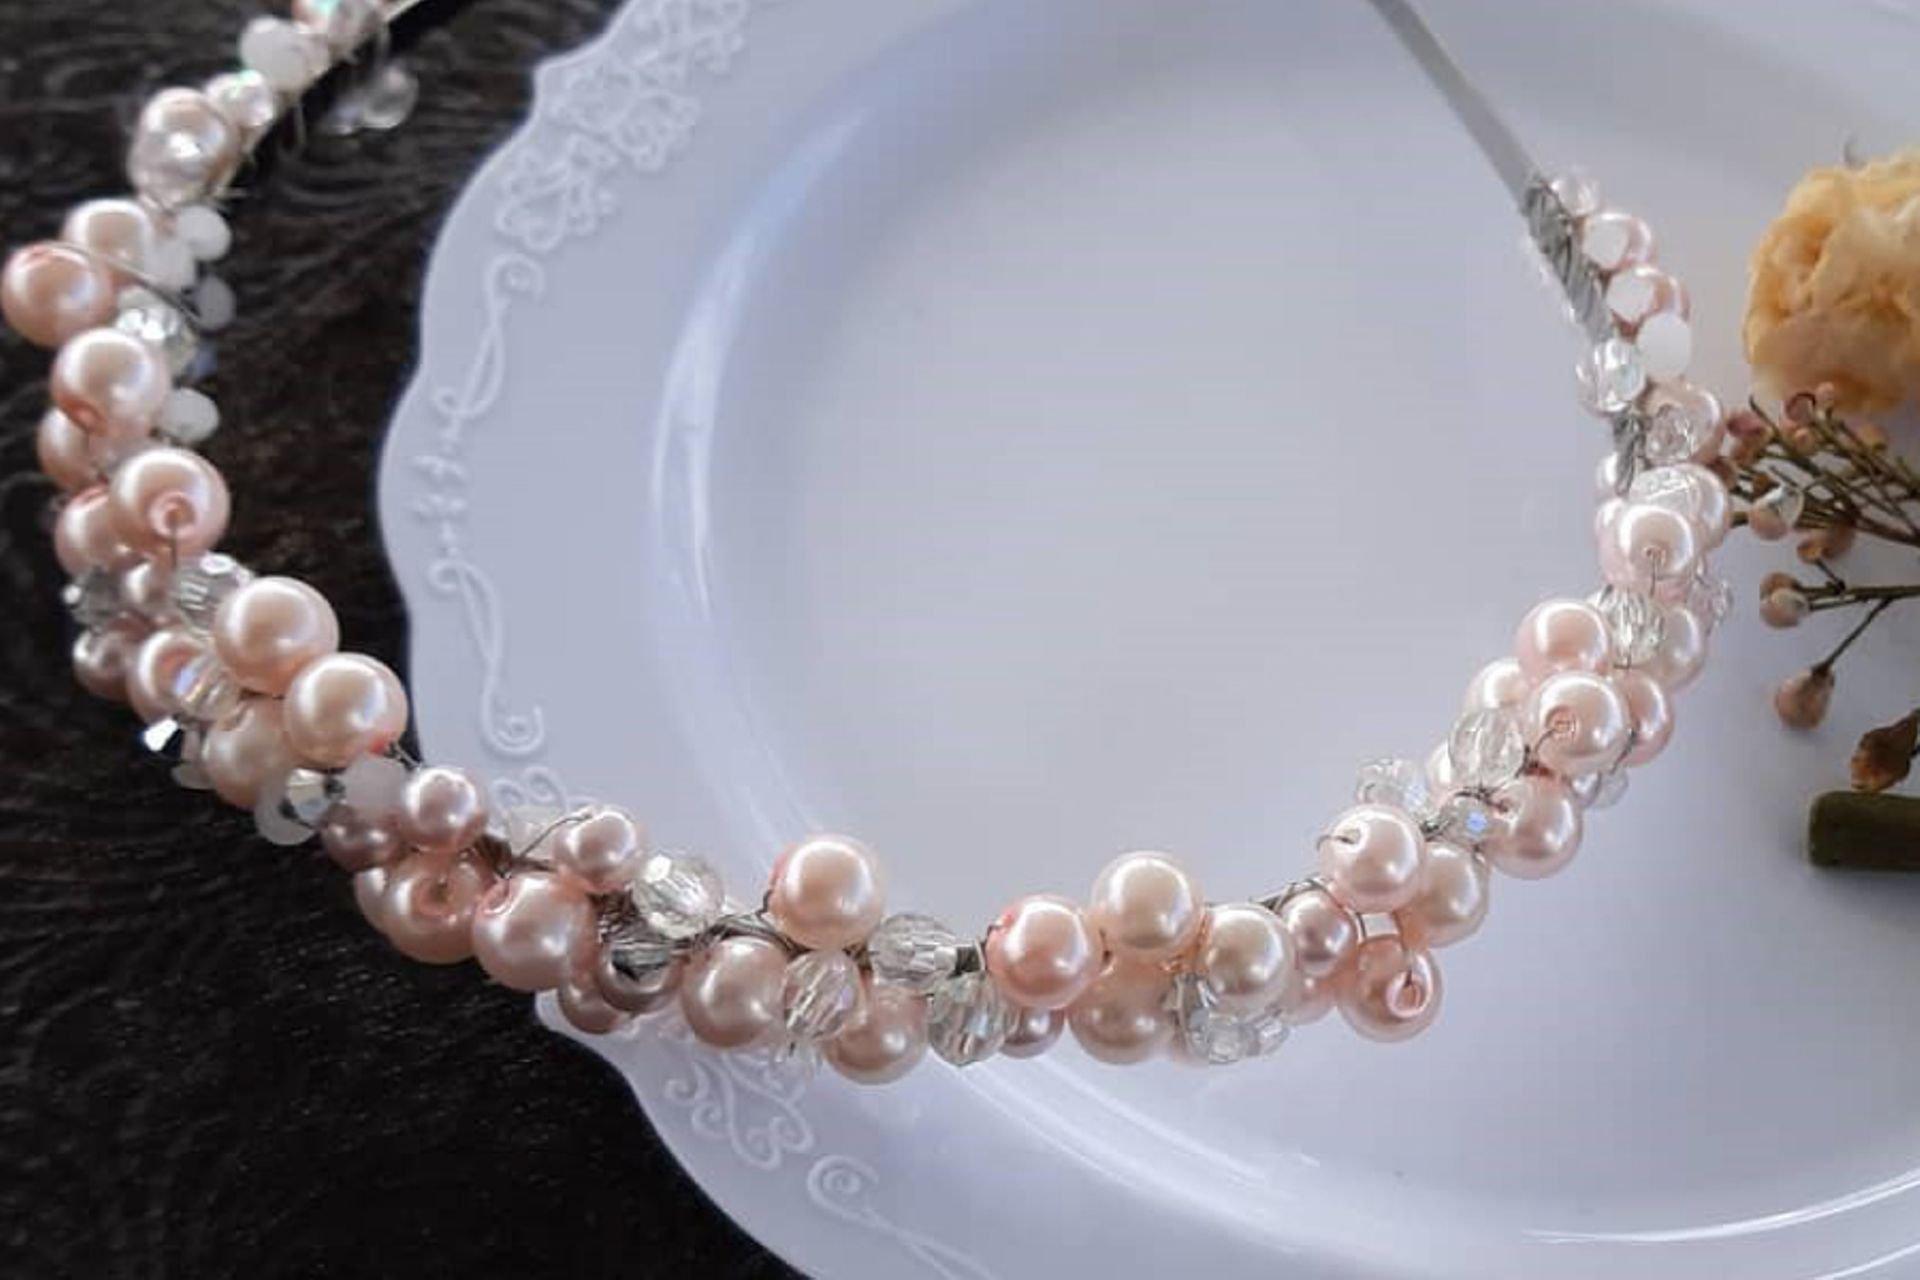 34 lantana beads jewelry designer תְמוּנָה